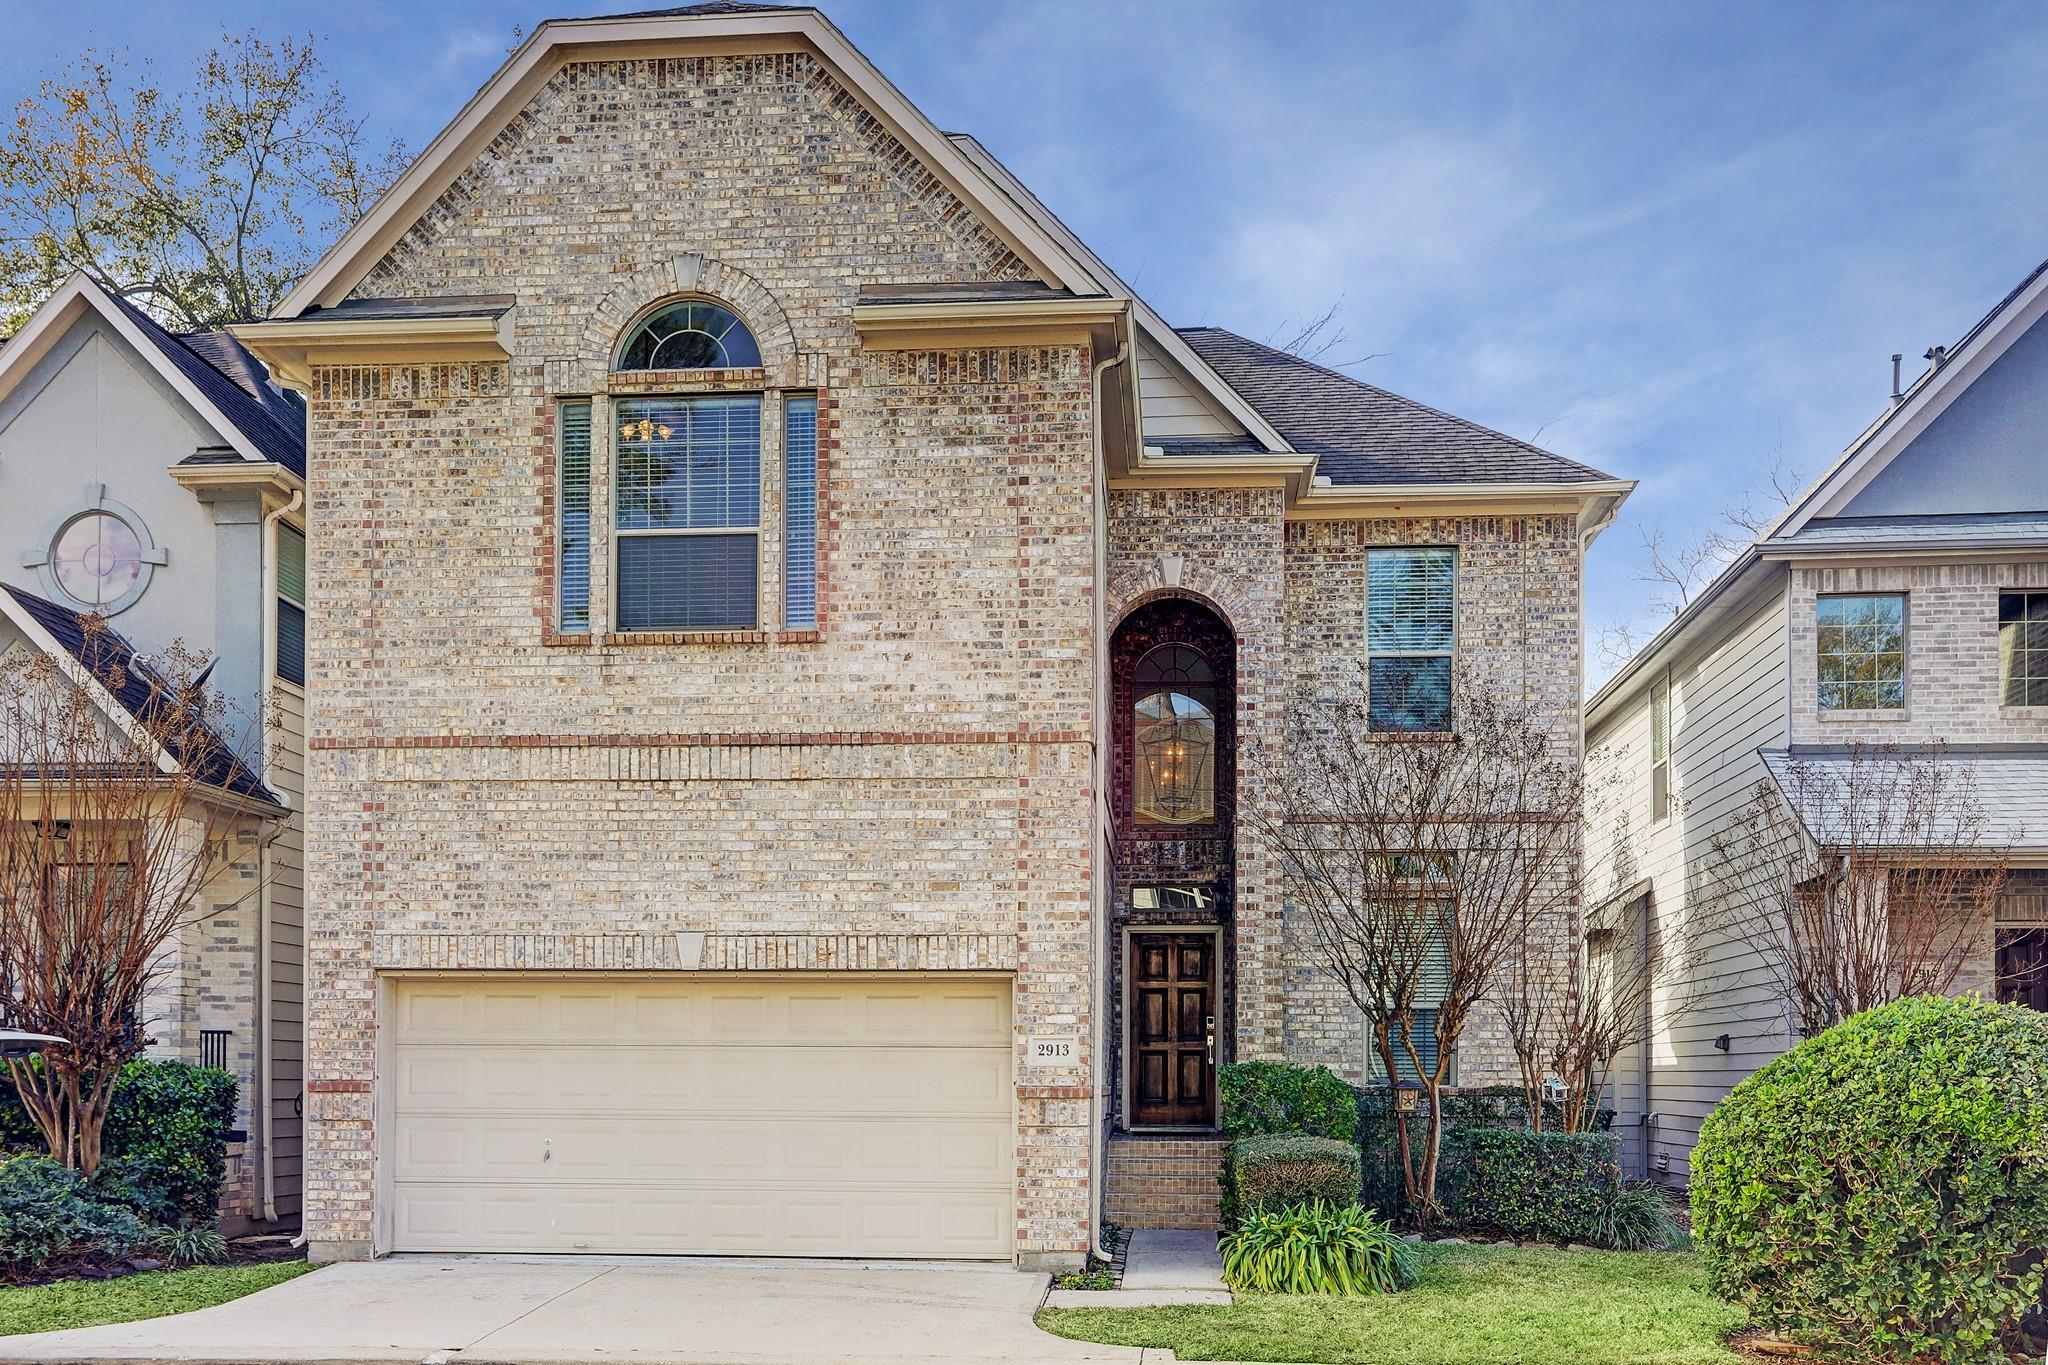 2913 N Becca Lane Property Photo - Houston, TX real estate listing